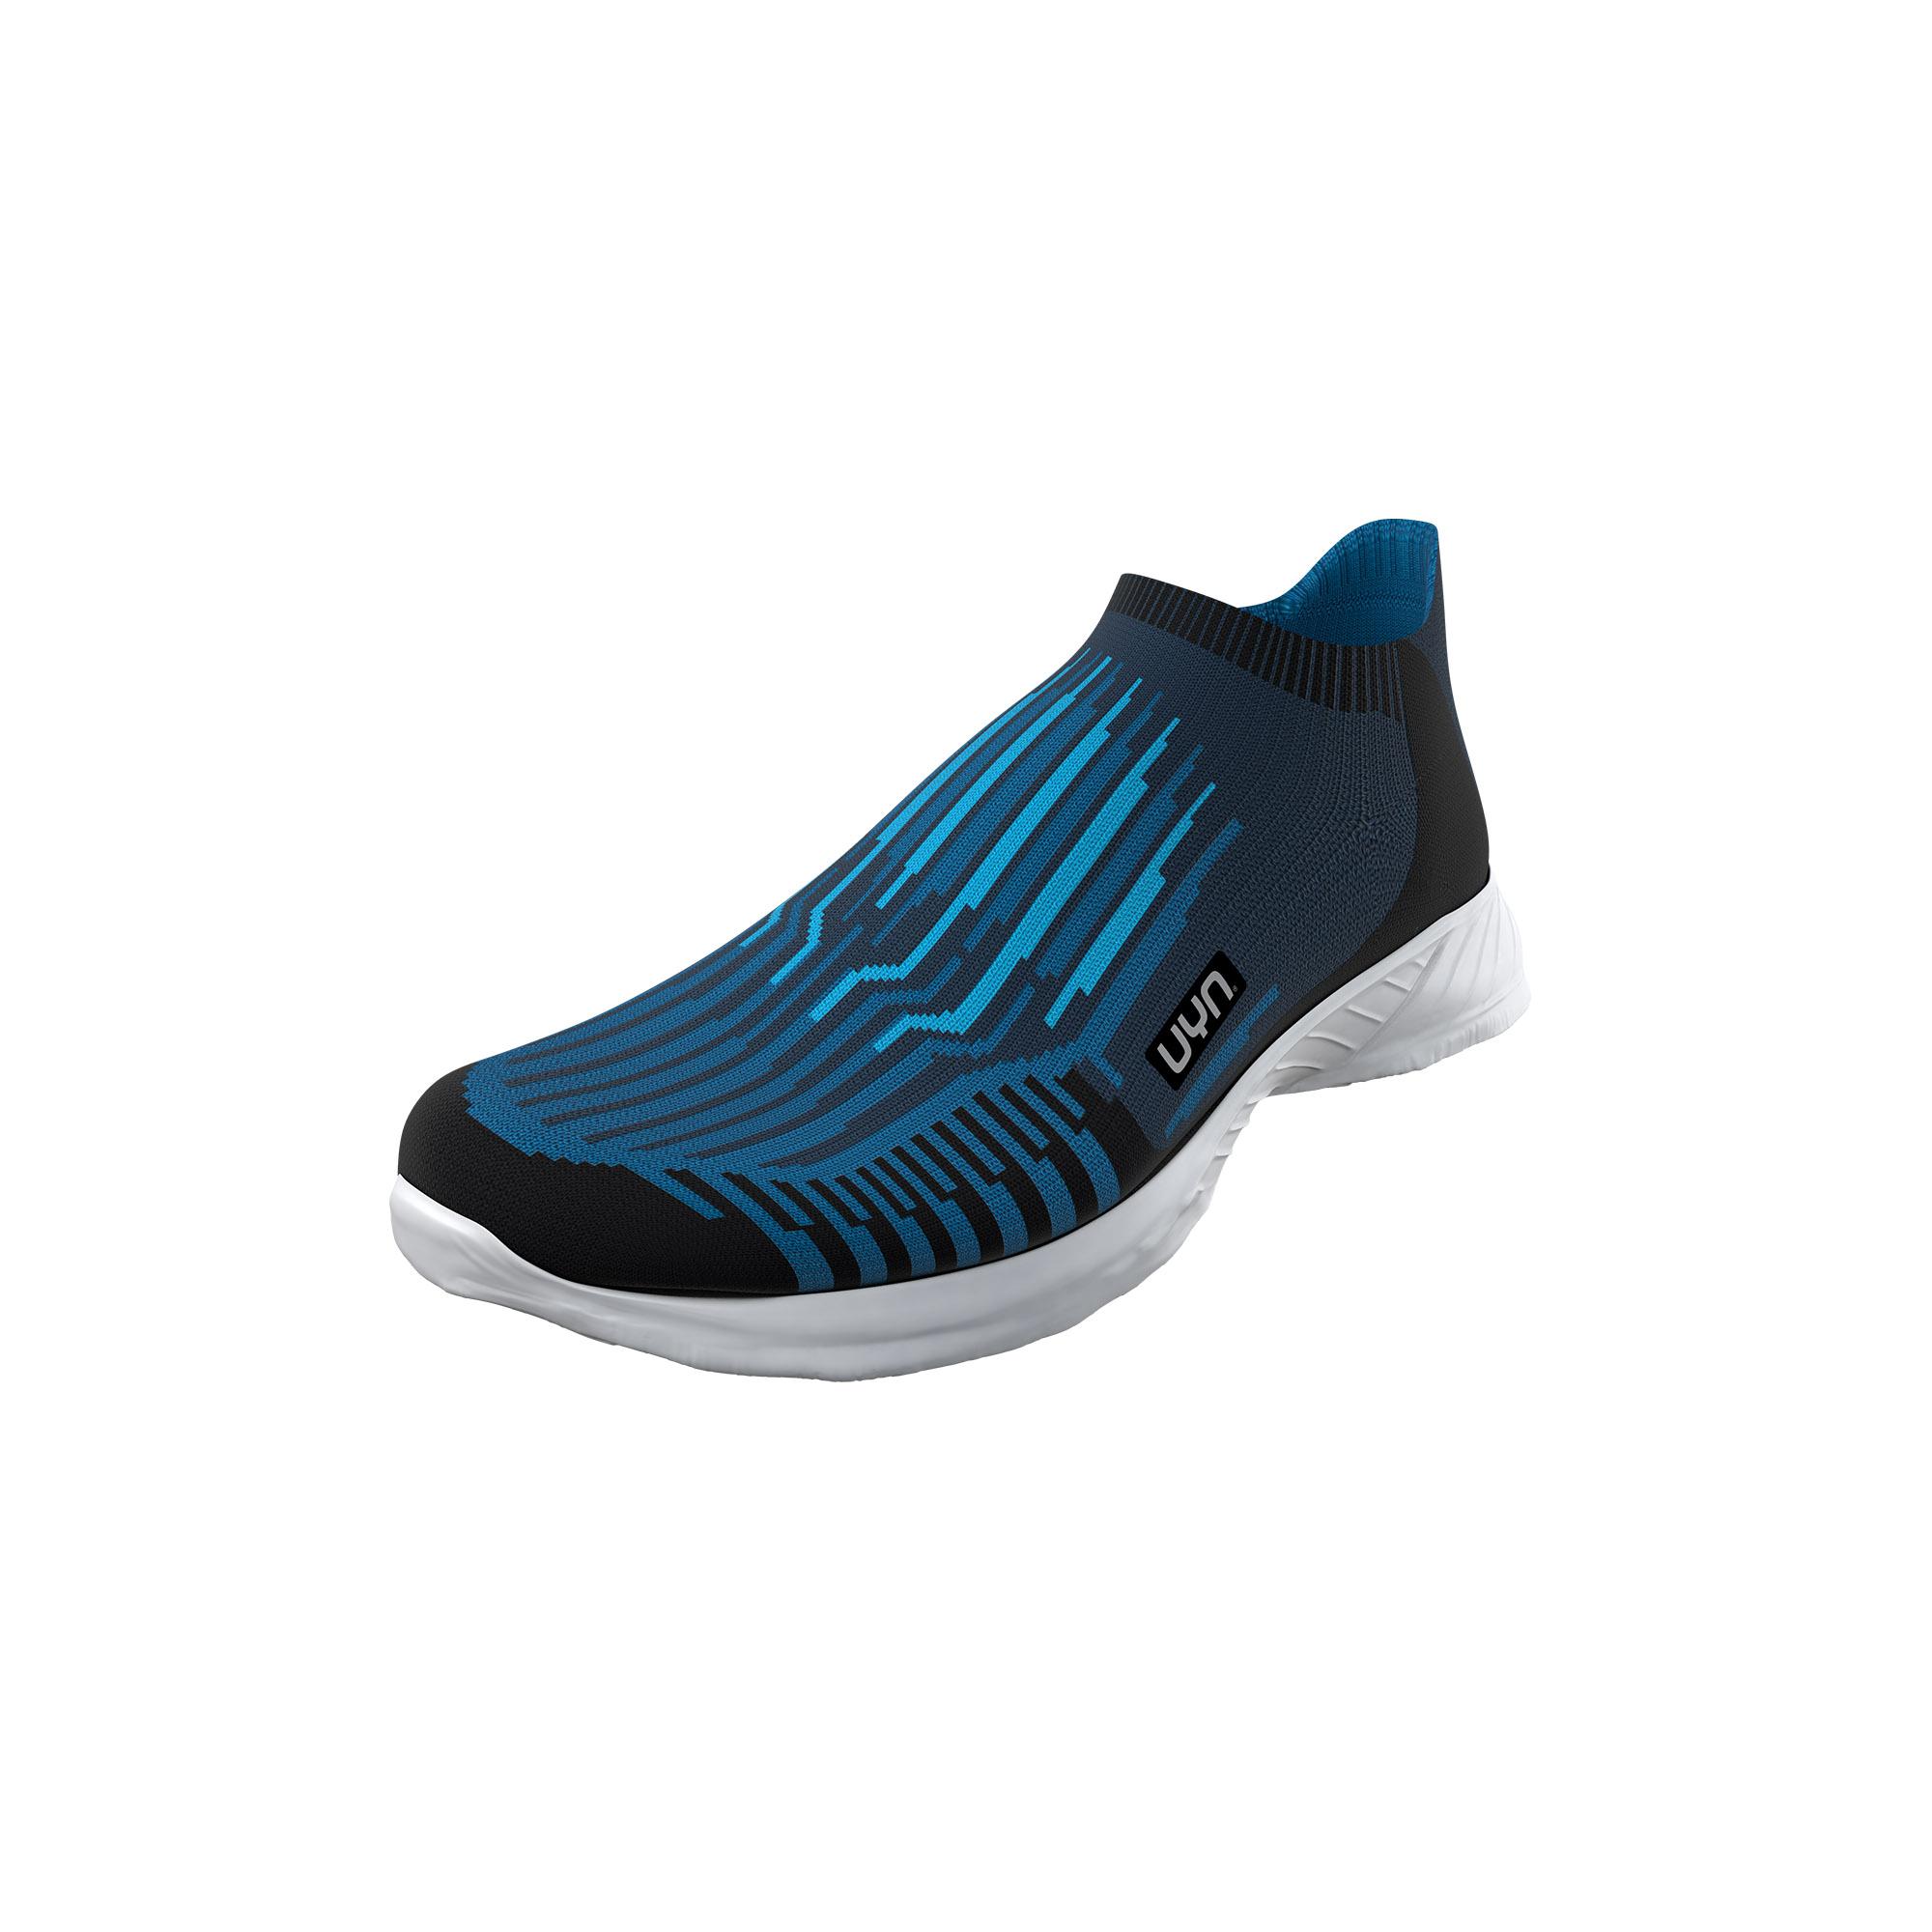 "UYN lanciert erste Sneaker Kollektion: Höchster Komfort, grüne Philosophie und Tech-nologie ""Made in Italy"""